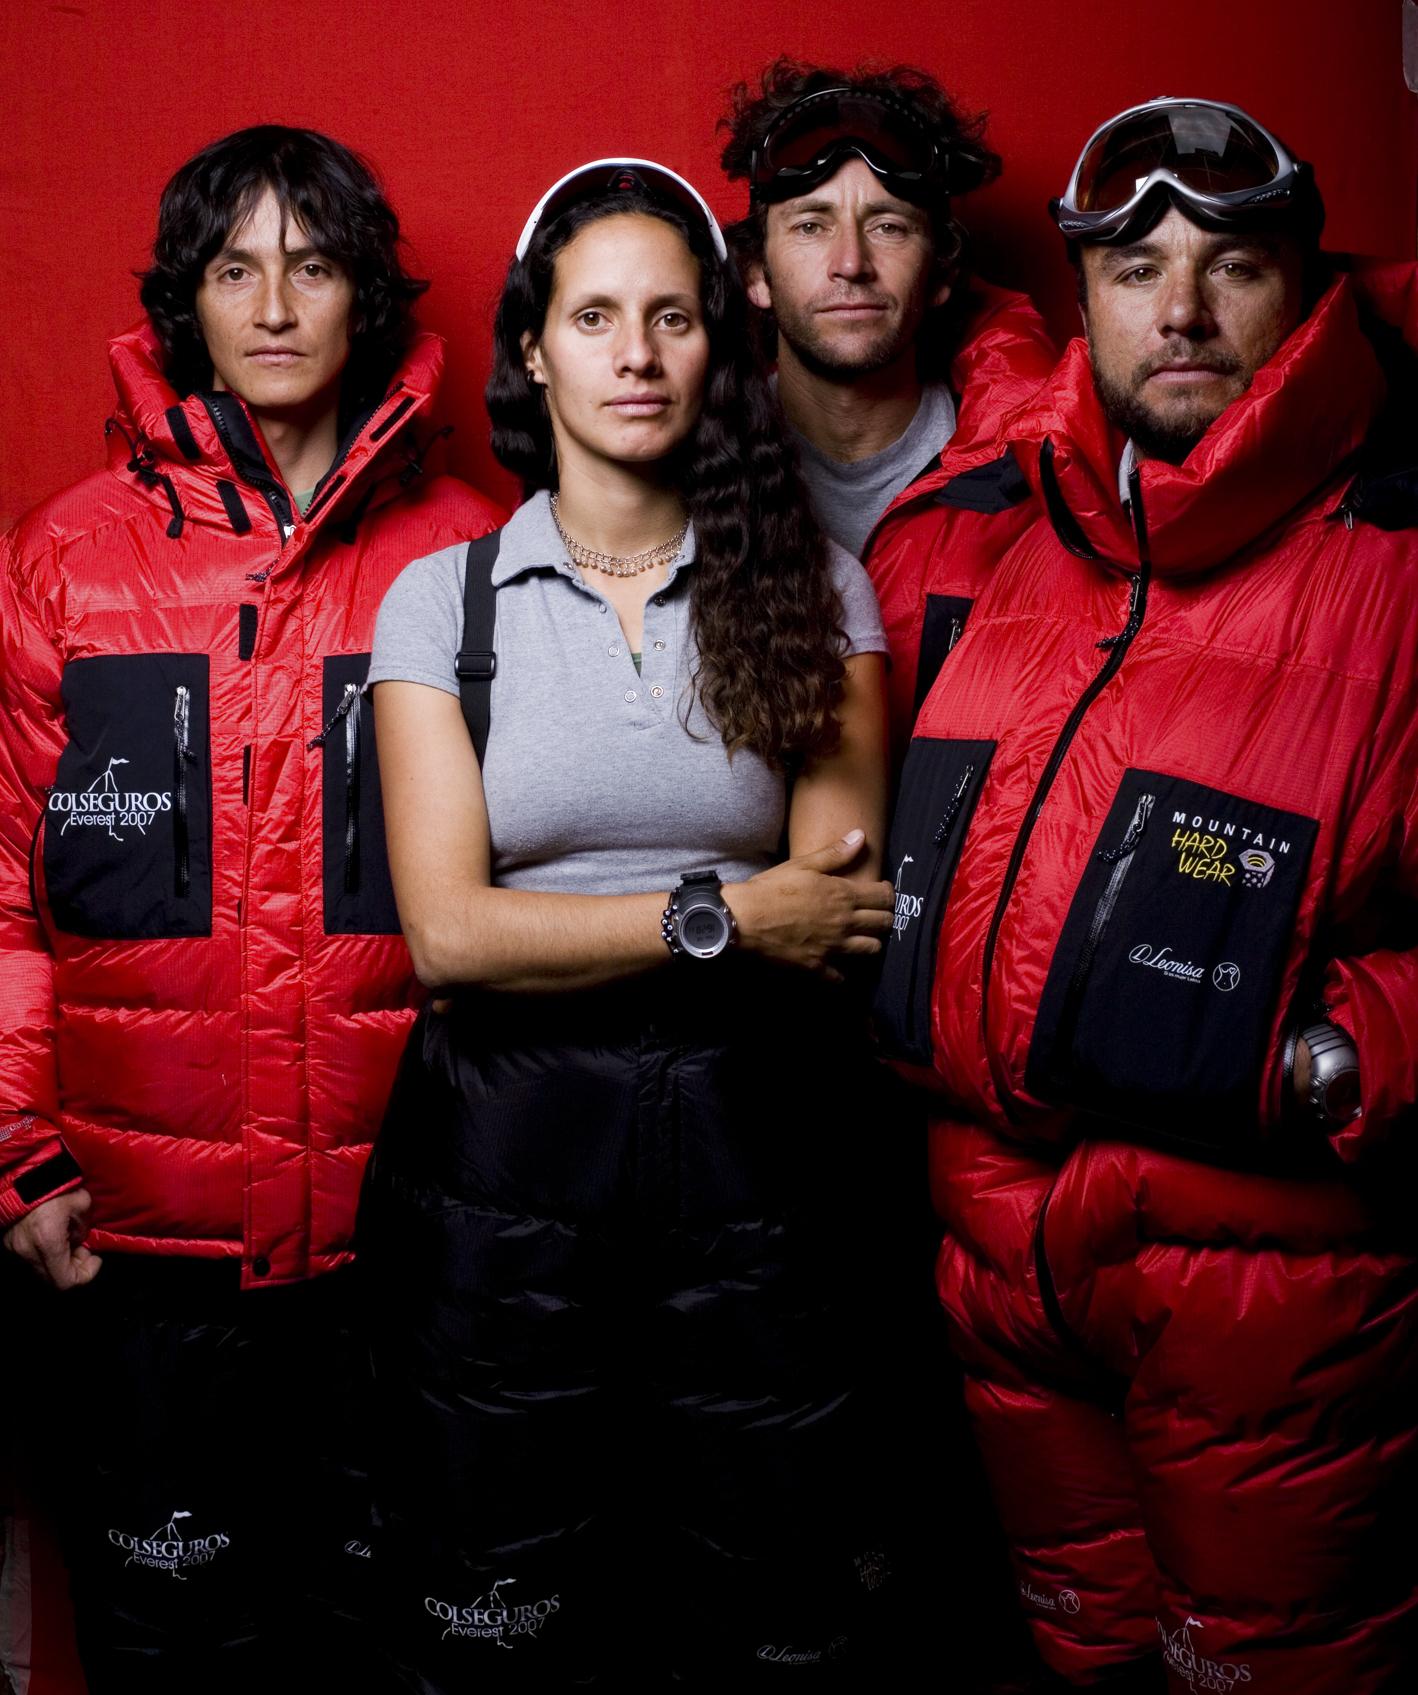 Revistas Don Juan (Equipo Everest (Colombia)b.jpg